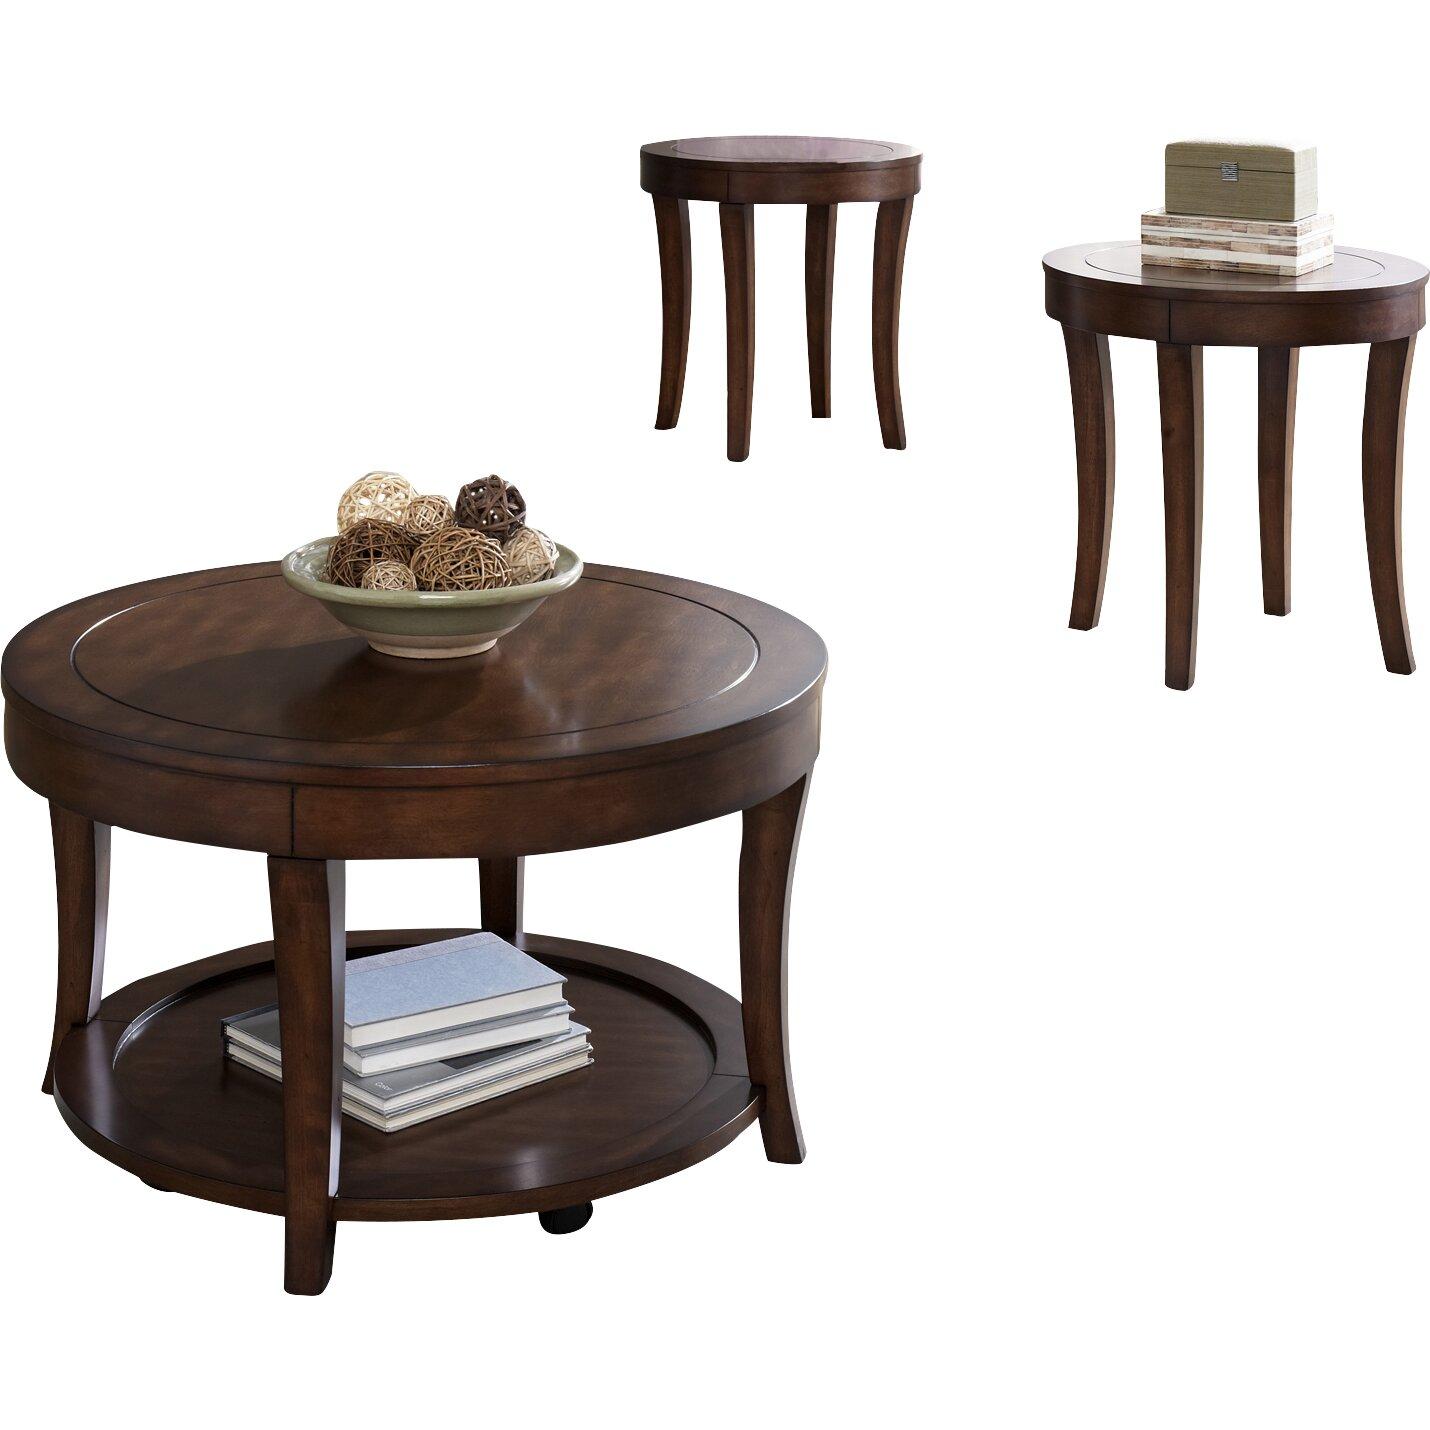 Coffee Table Set Of 3 Darby Home Co Locke 3 Piece Coffee Table Set Reviews Wayfair